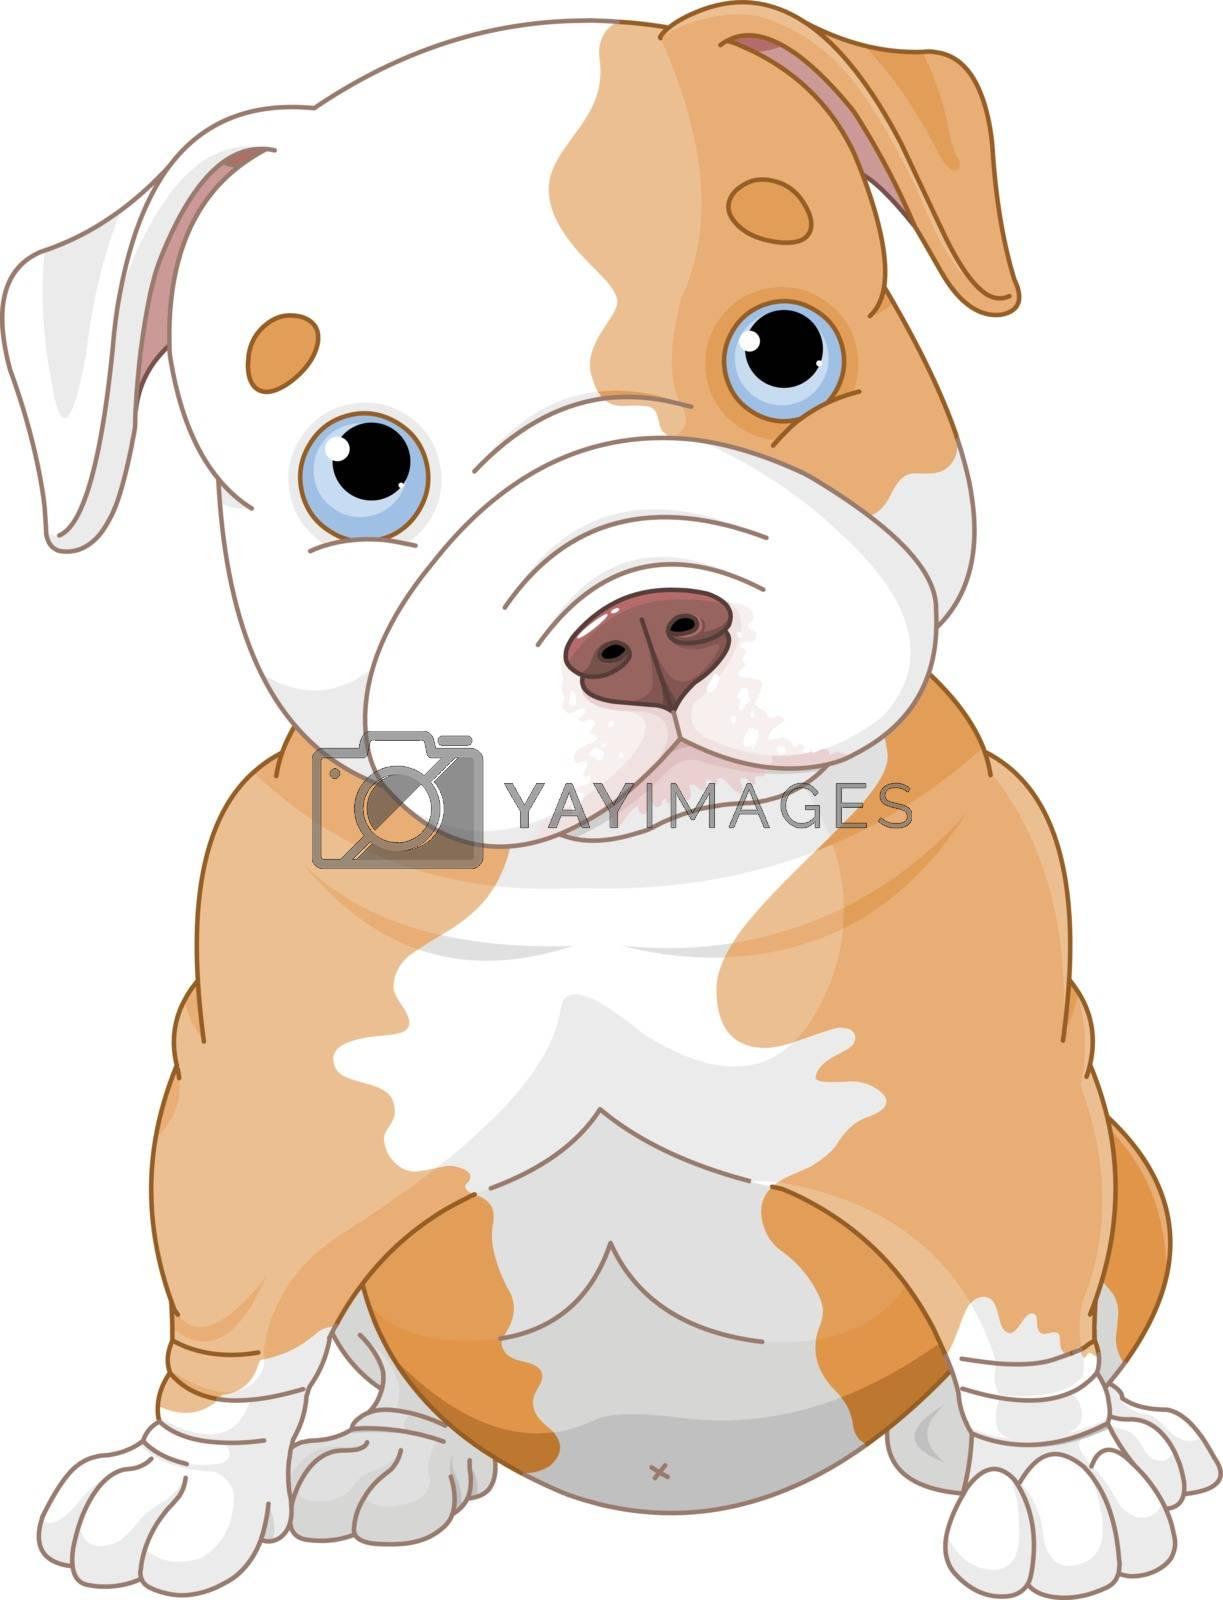 Royalty free image of Pitbull puppy by Dazdraperma